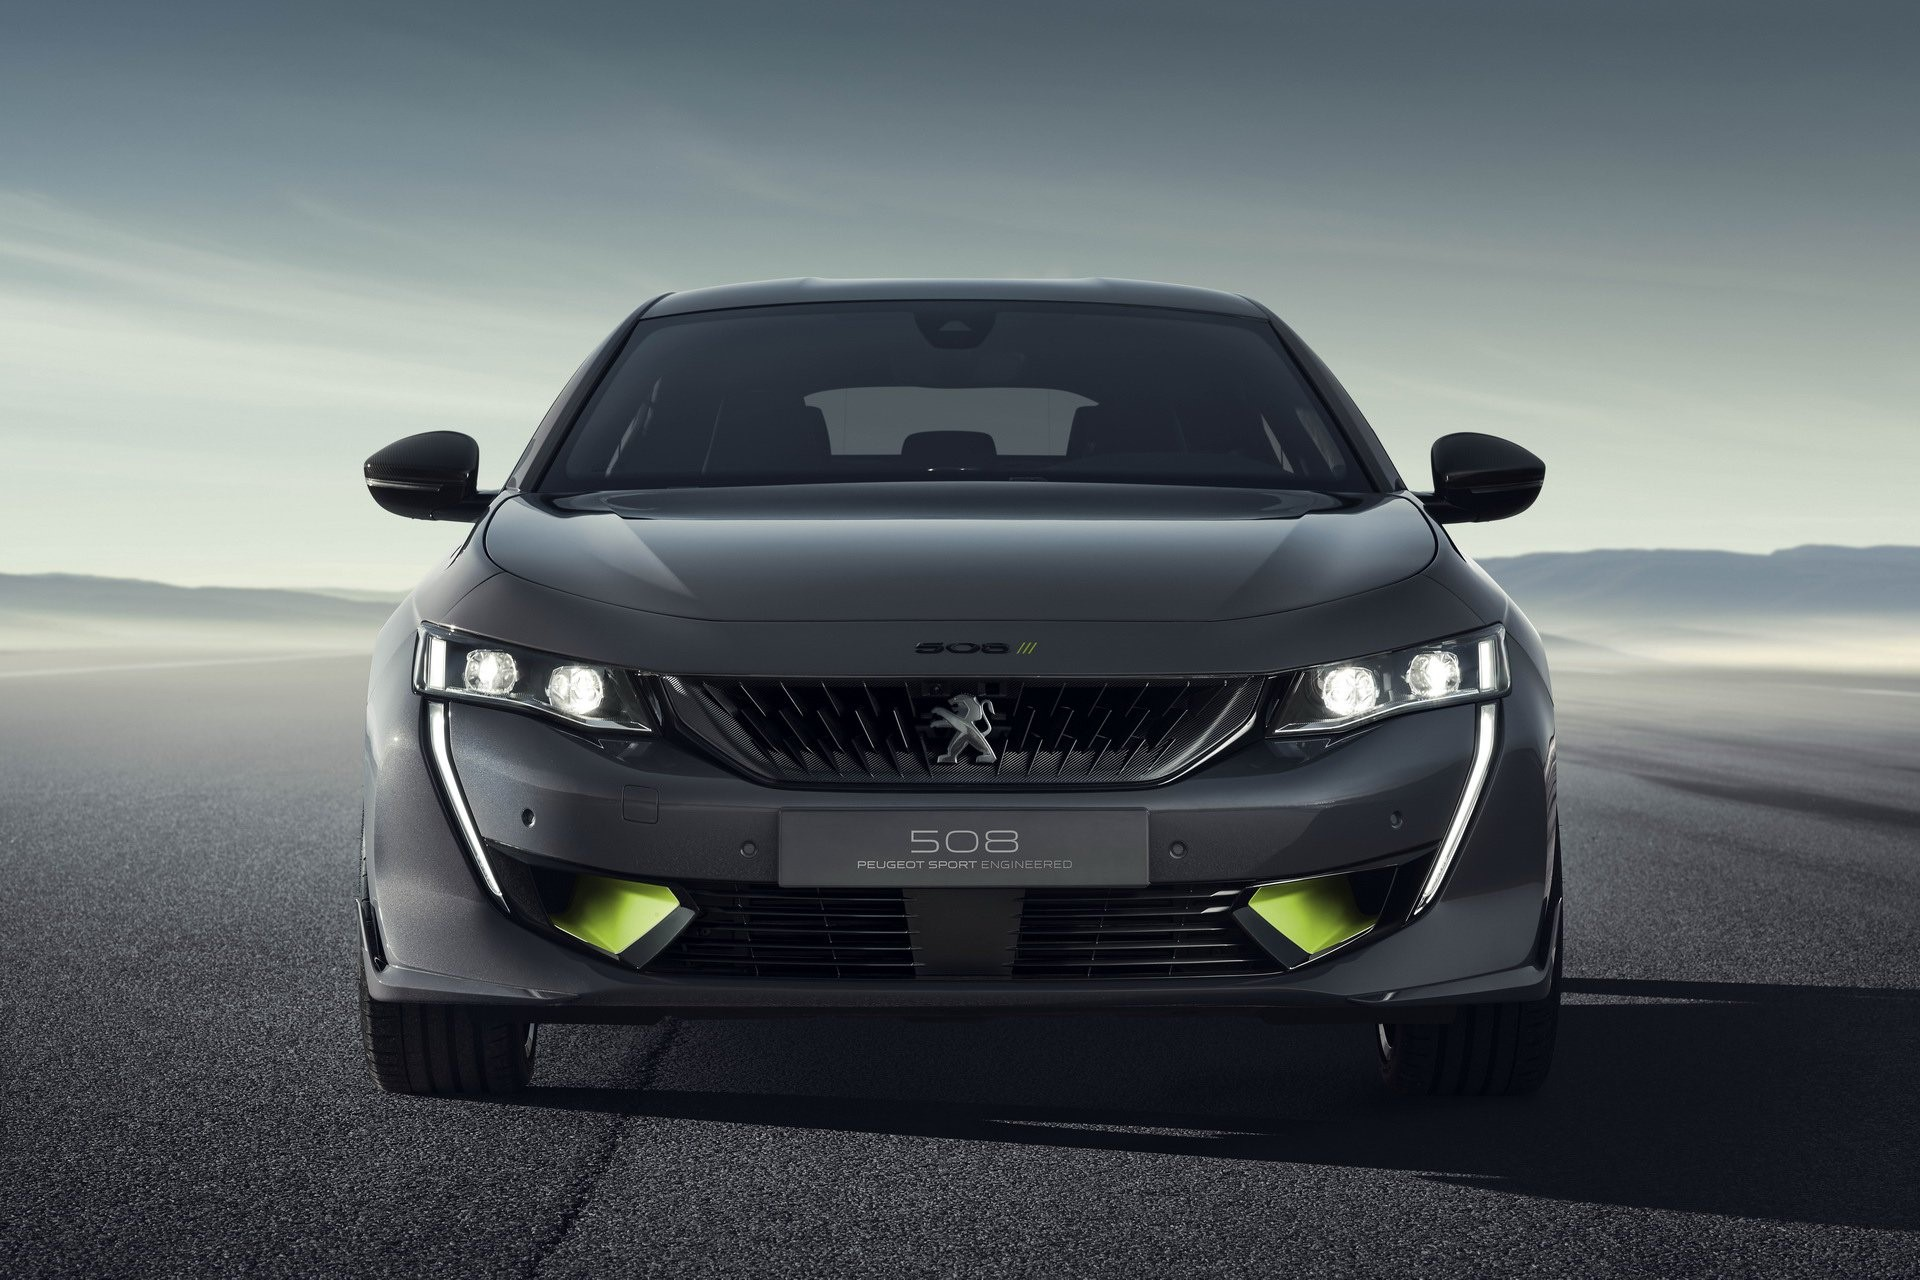 Peugeot 508 Sport Engineered Concept (2)